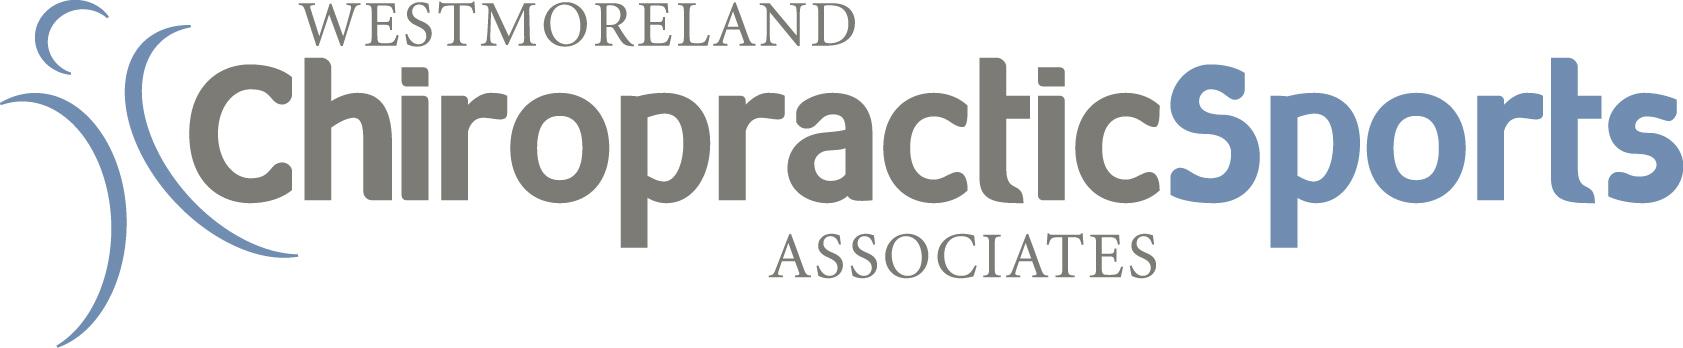 Westmoreland Chiropractic Sports Associates